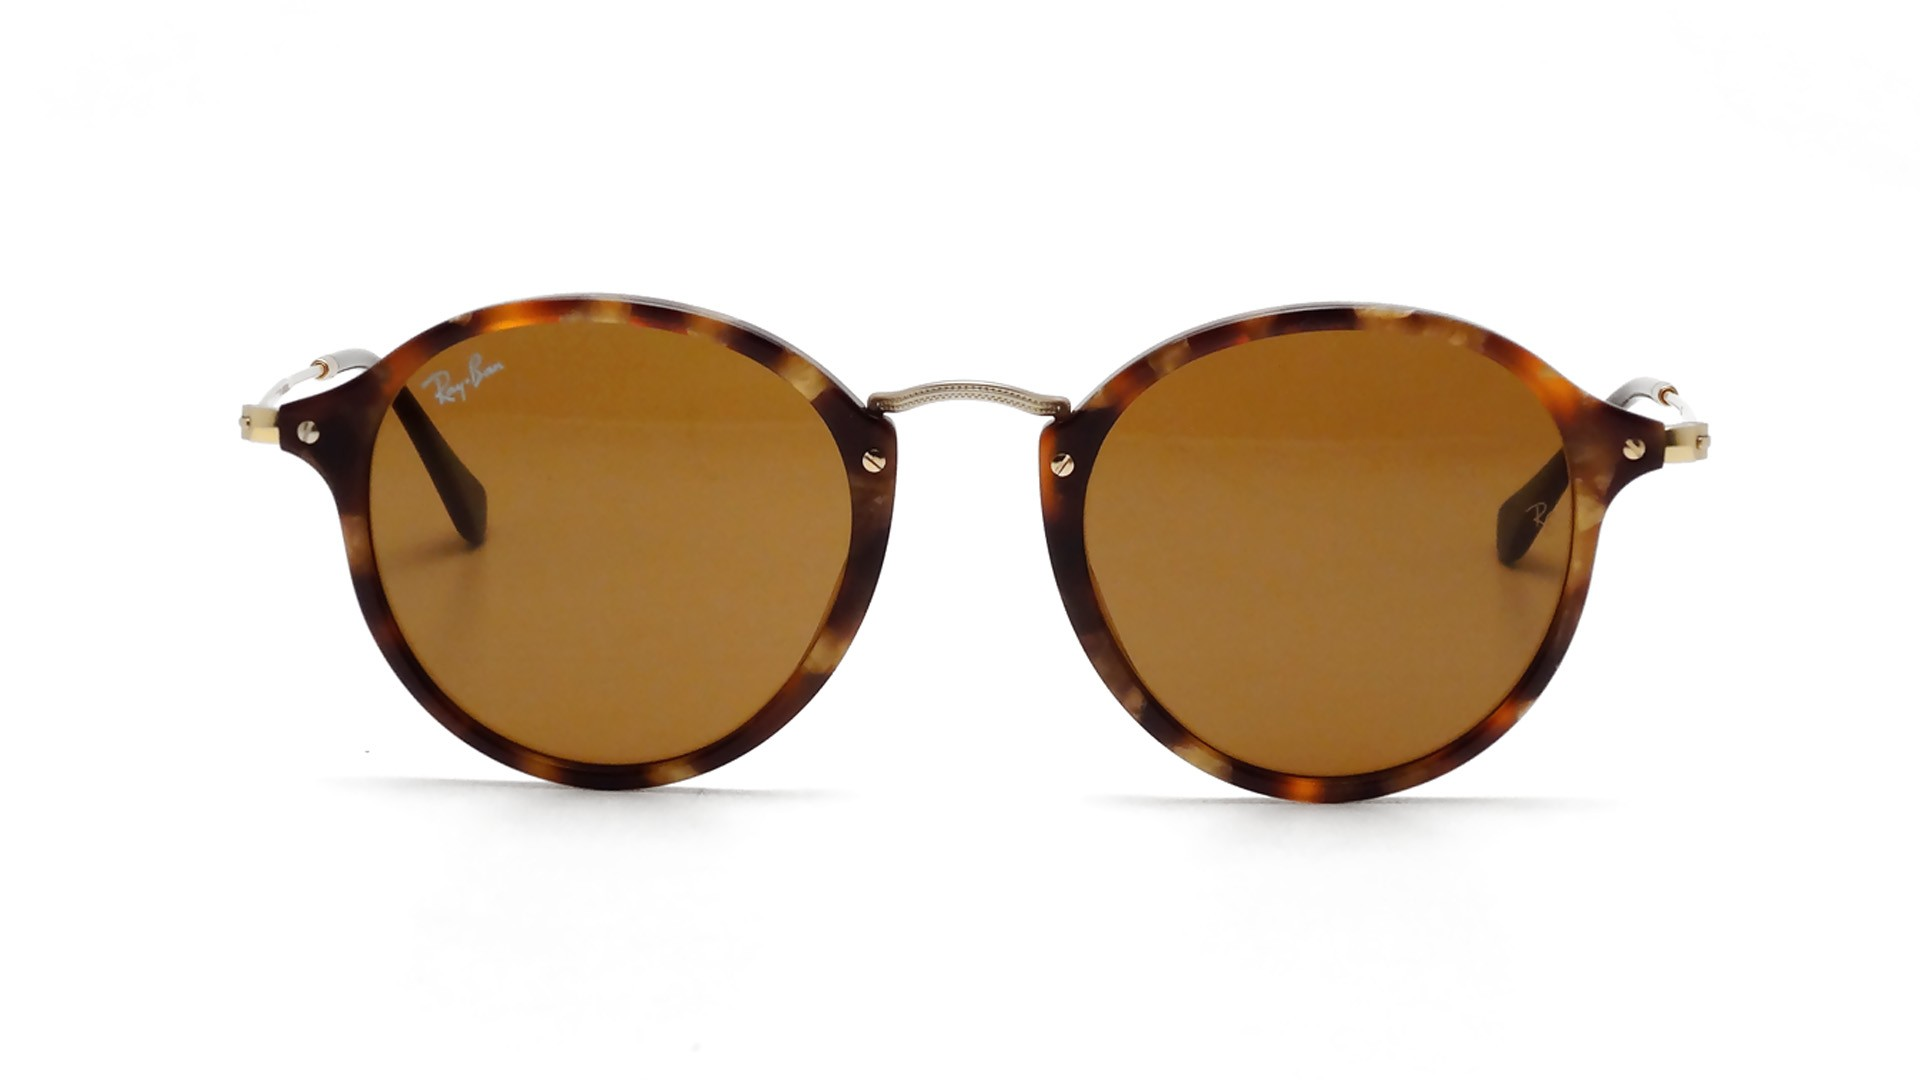 316ccc79ce Sunglasses Ray-Ban Round Fleck Tortoise B15 RB2447 1160 49-21 Medium